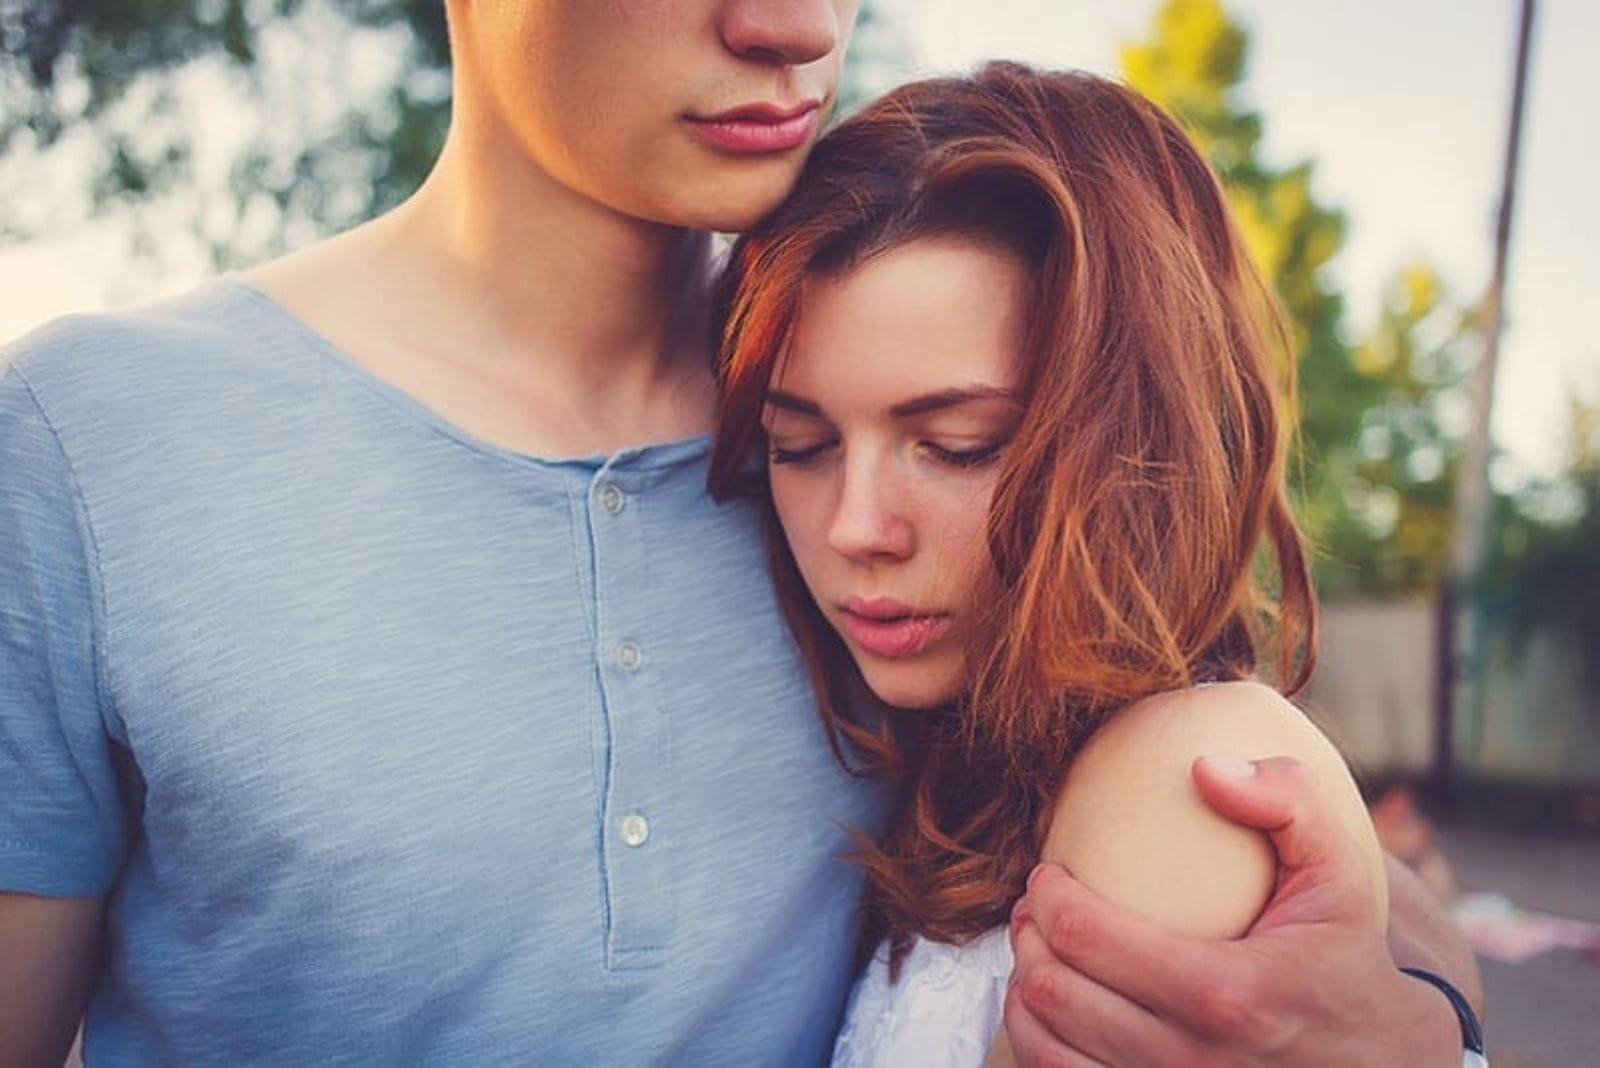 the man hugged the woman